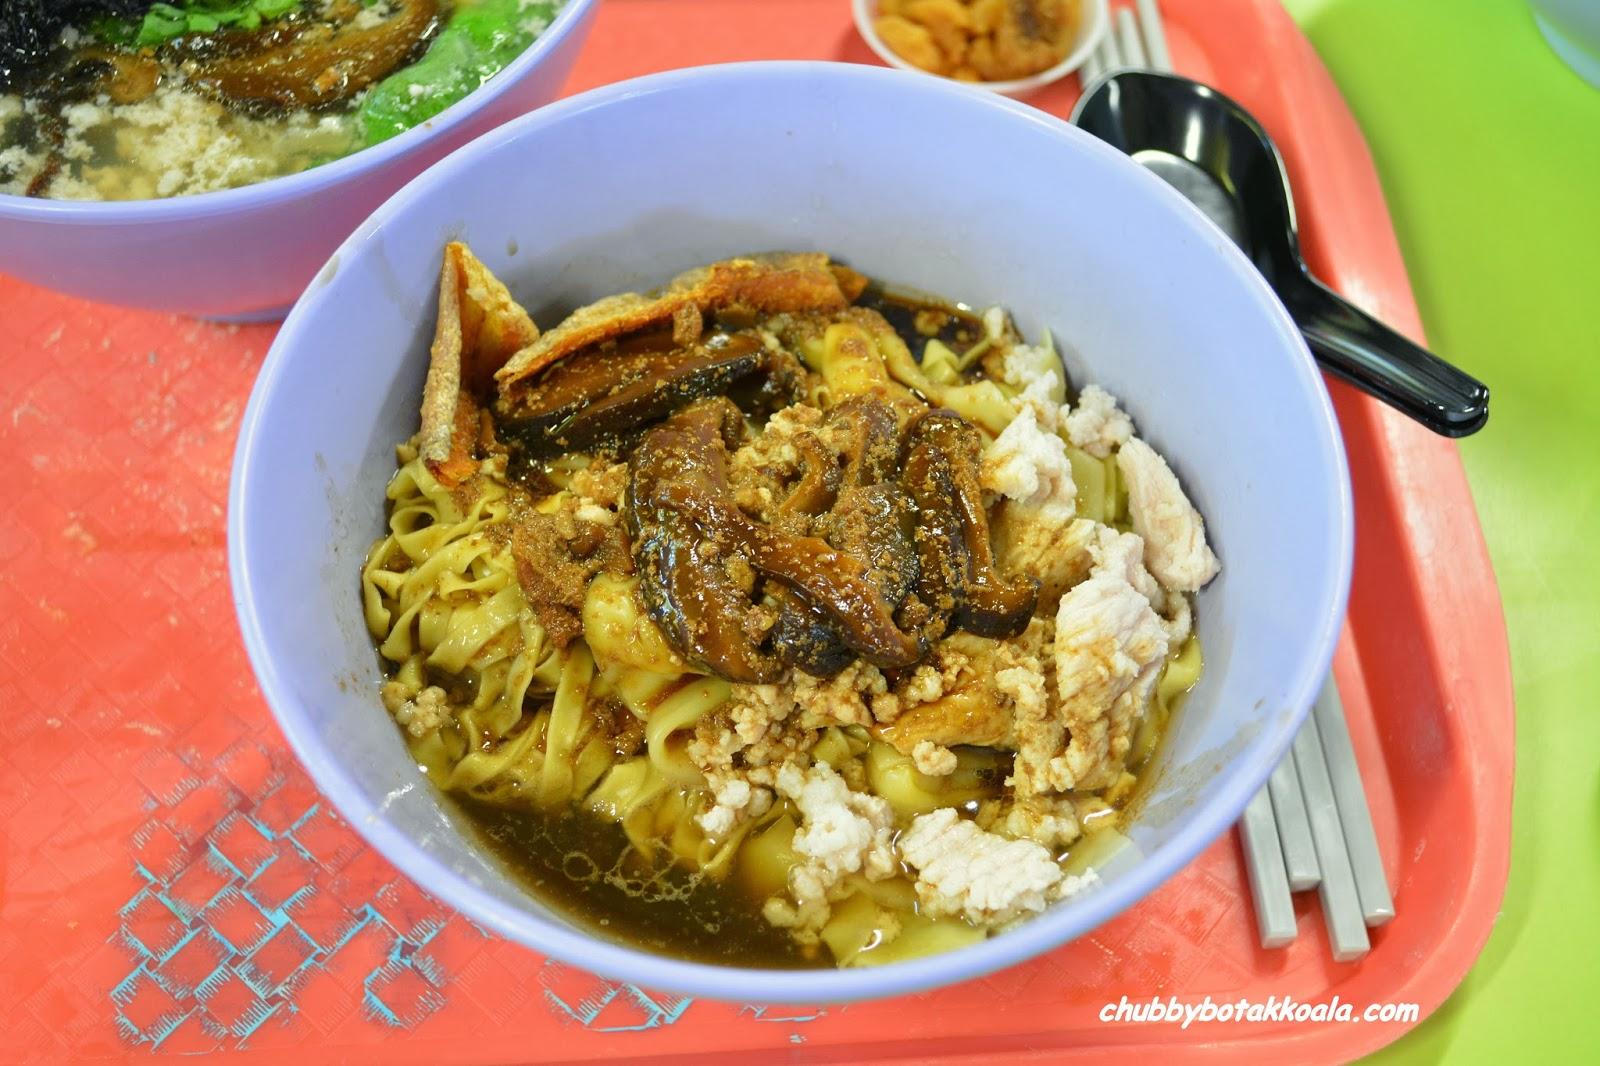 Chubby Botak Koala Singapore Food Blog Travel And Lifestyle Ah Kow Mushroom Minced Pork Mee Legendary Bak Chor Mee